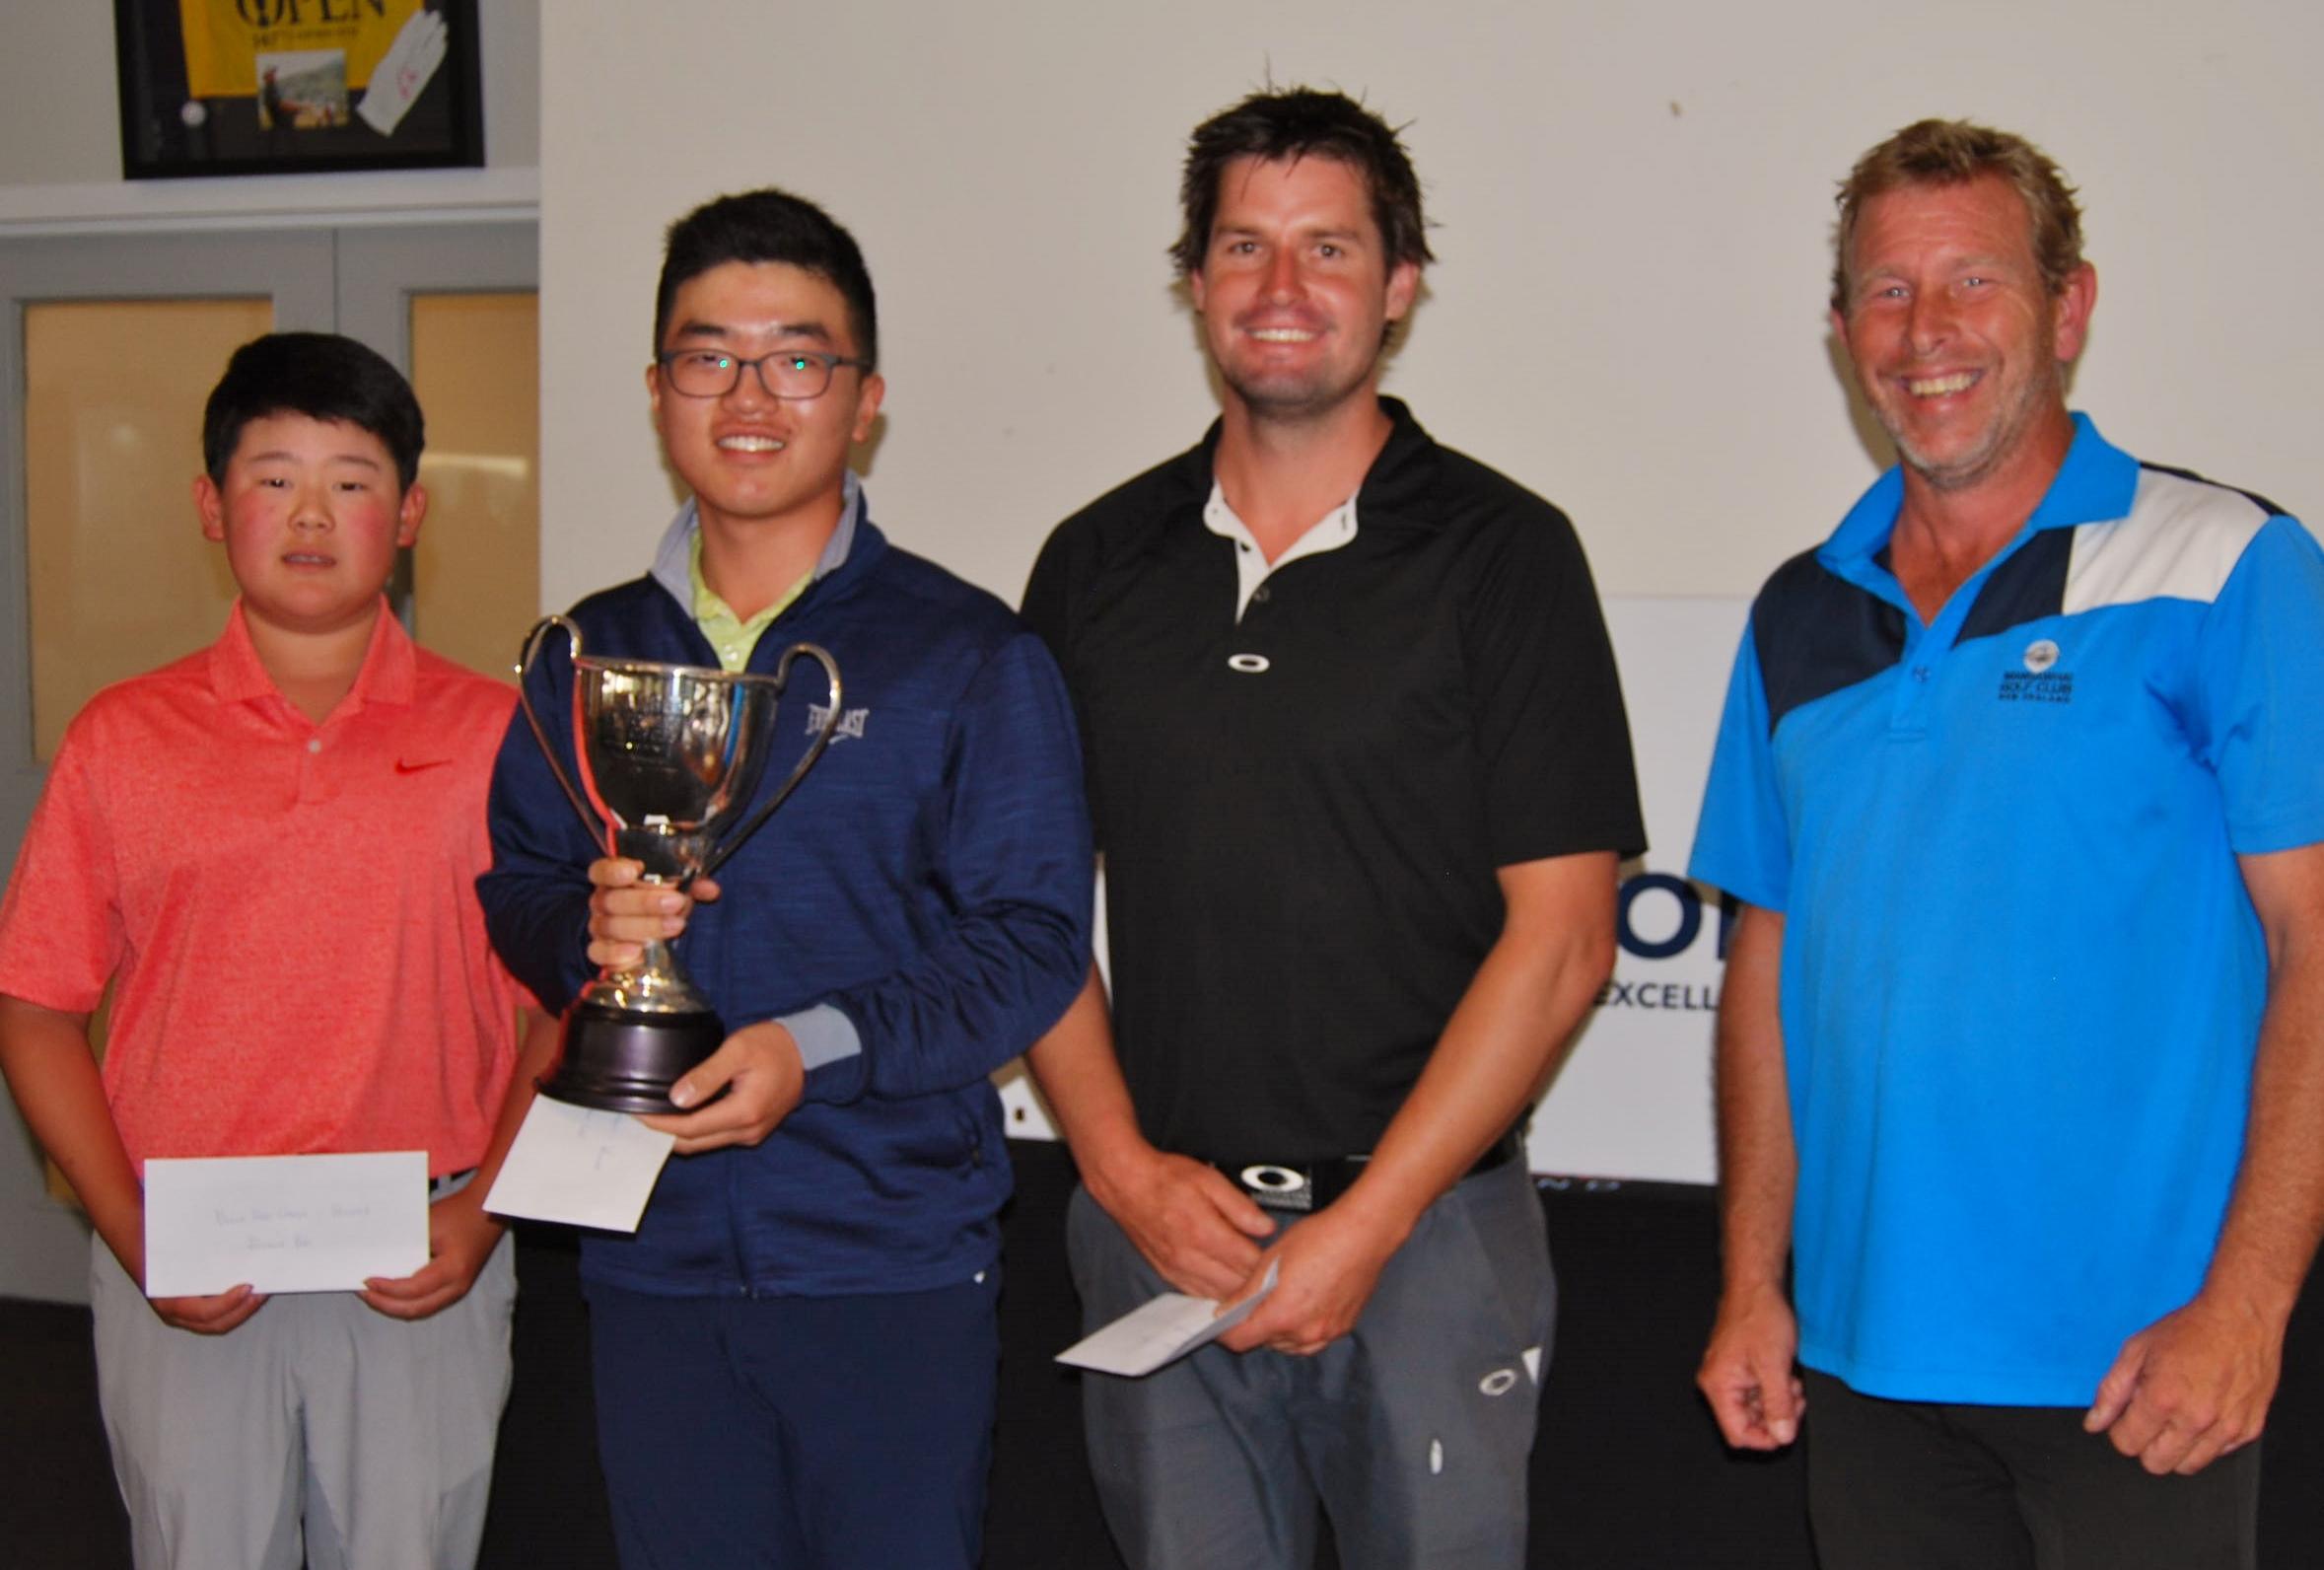 Winning group (from left): Joshua Bai (2nd), Jang Hyun Lee (winner of Tom Bonnington Cup), Scott Wightman (3rd), Men's Club Captain Barry Brennan